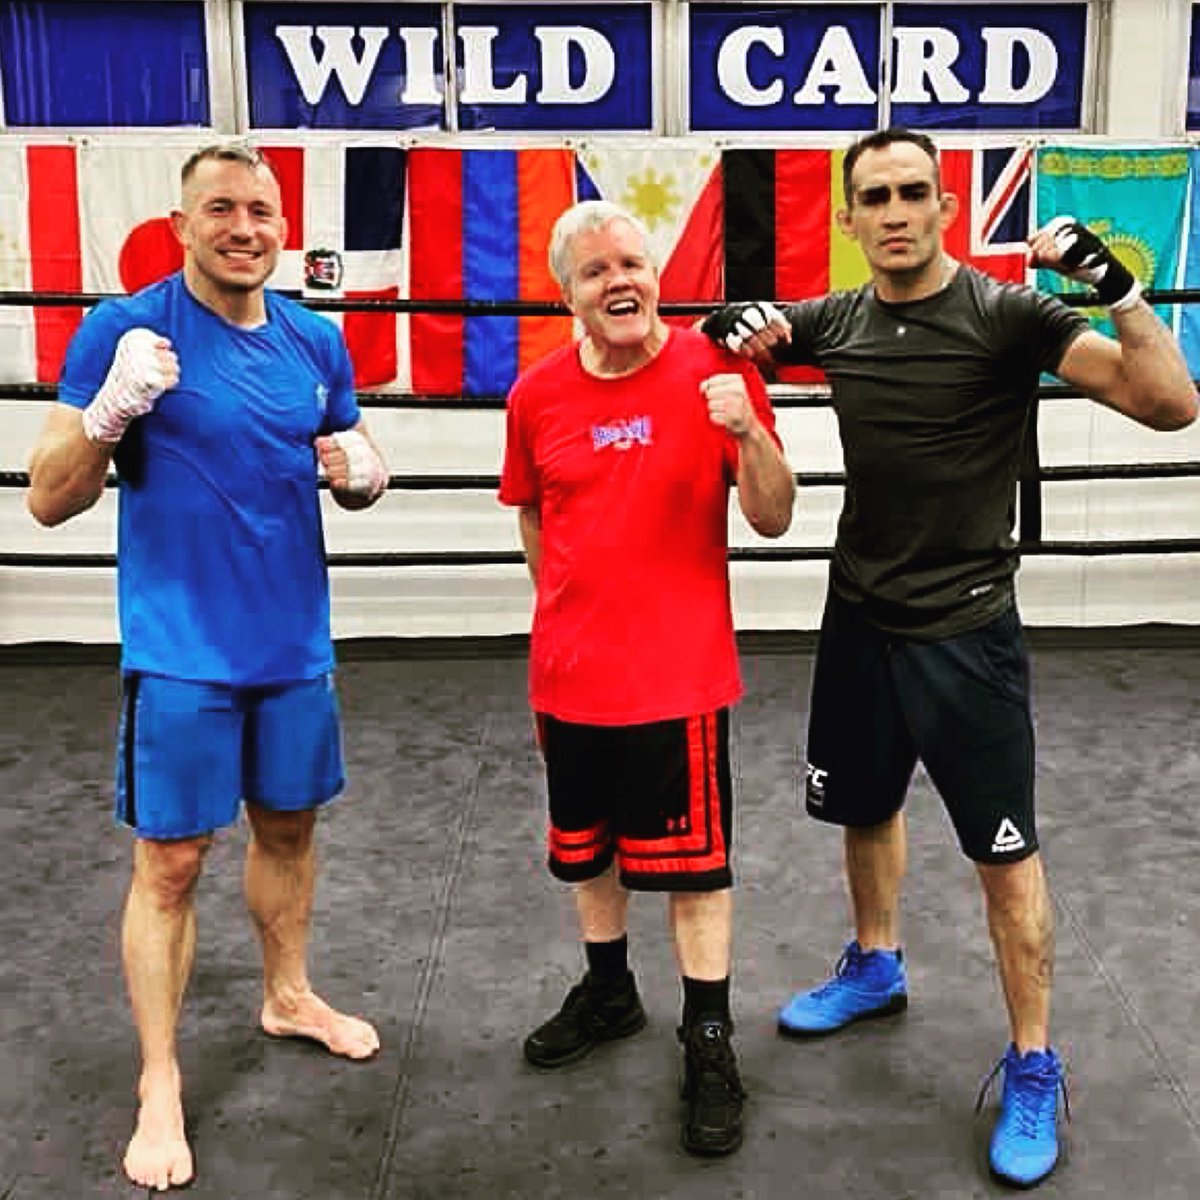 On a Monday @GeorgesStPierre @FreddieRoach and @TonyFergusonXT #wildcardboxing #wildcardboxingclub #thehousethatFREDDIEbuilt @WildCardBoxing1 @ufc @danawhite https://t.co/zOvNbEeHiK